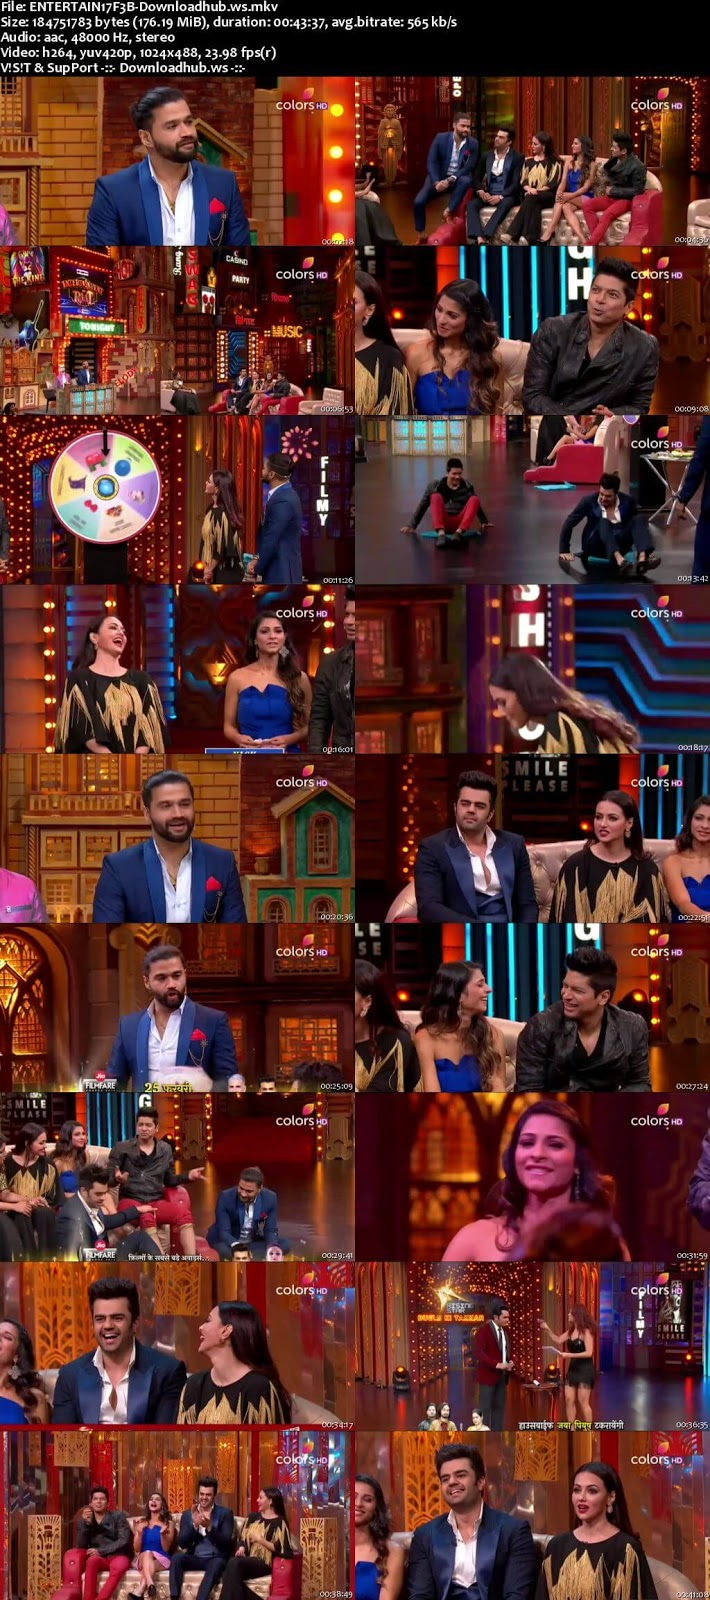 Entertainment Ki Raat 17 February 2018 Episode 26 HDTV 480p